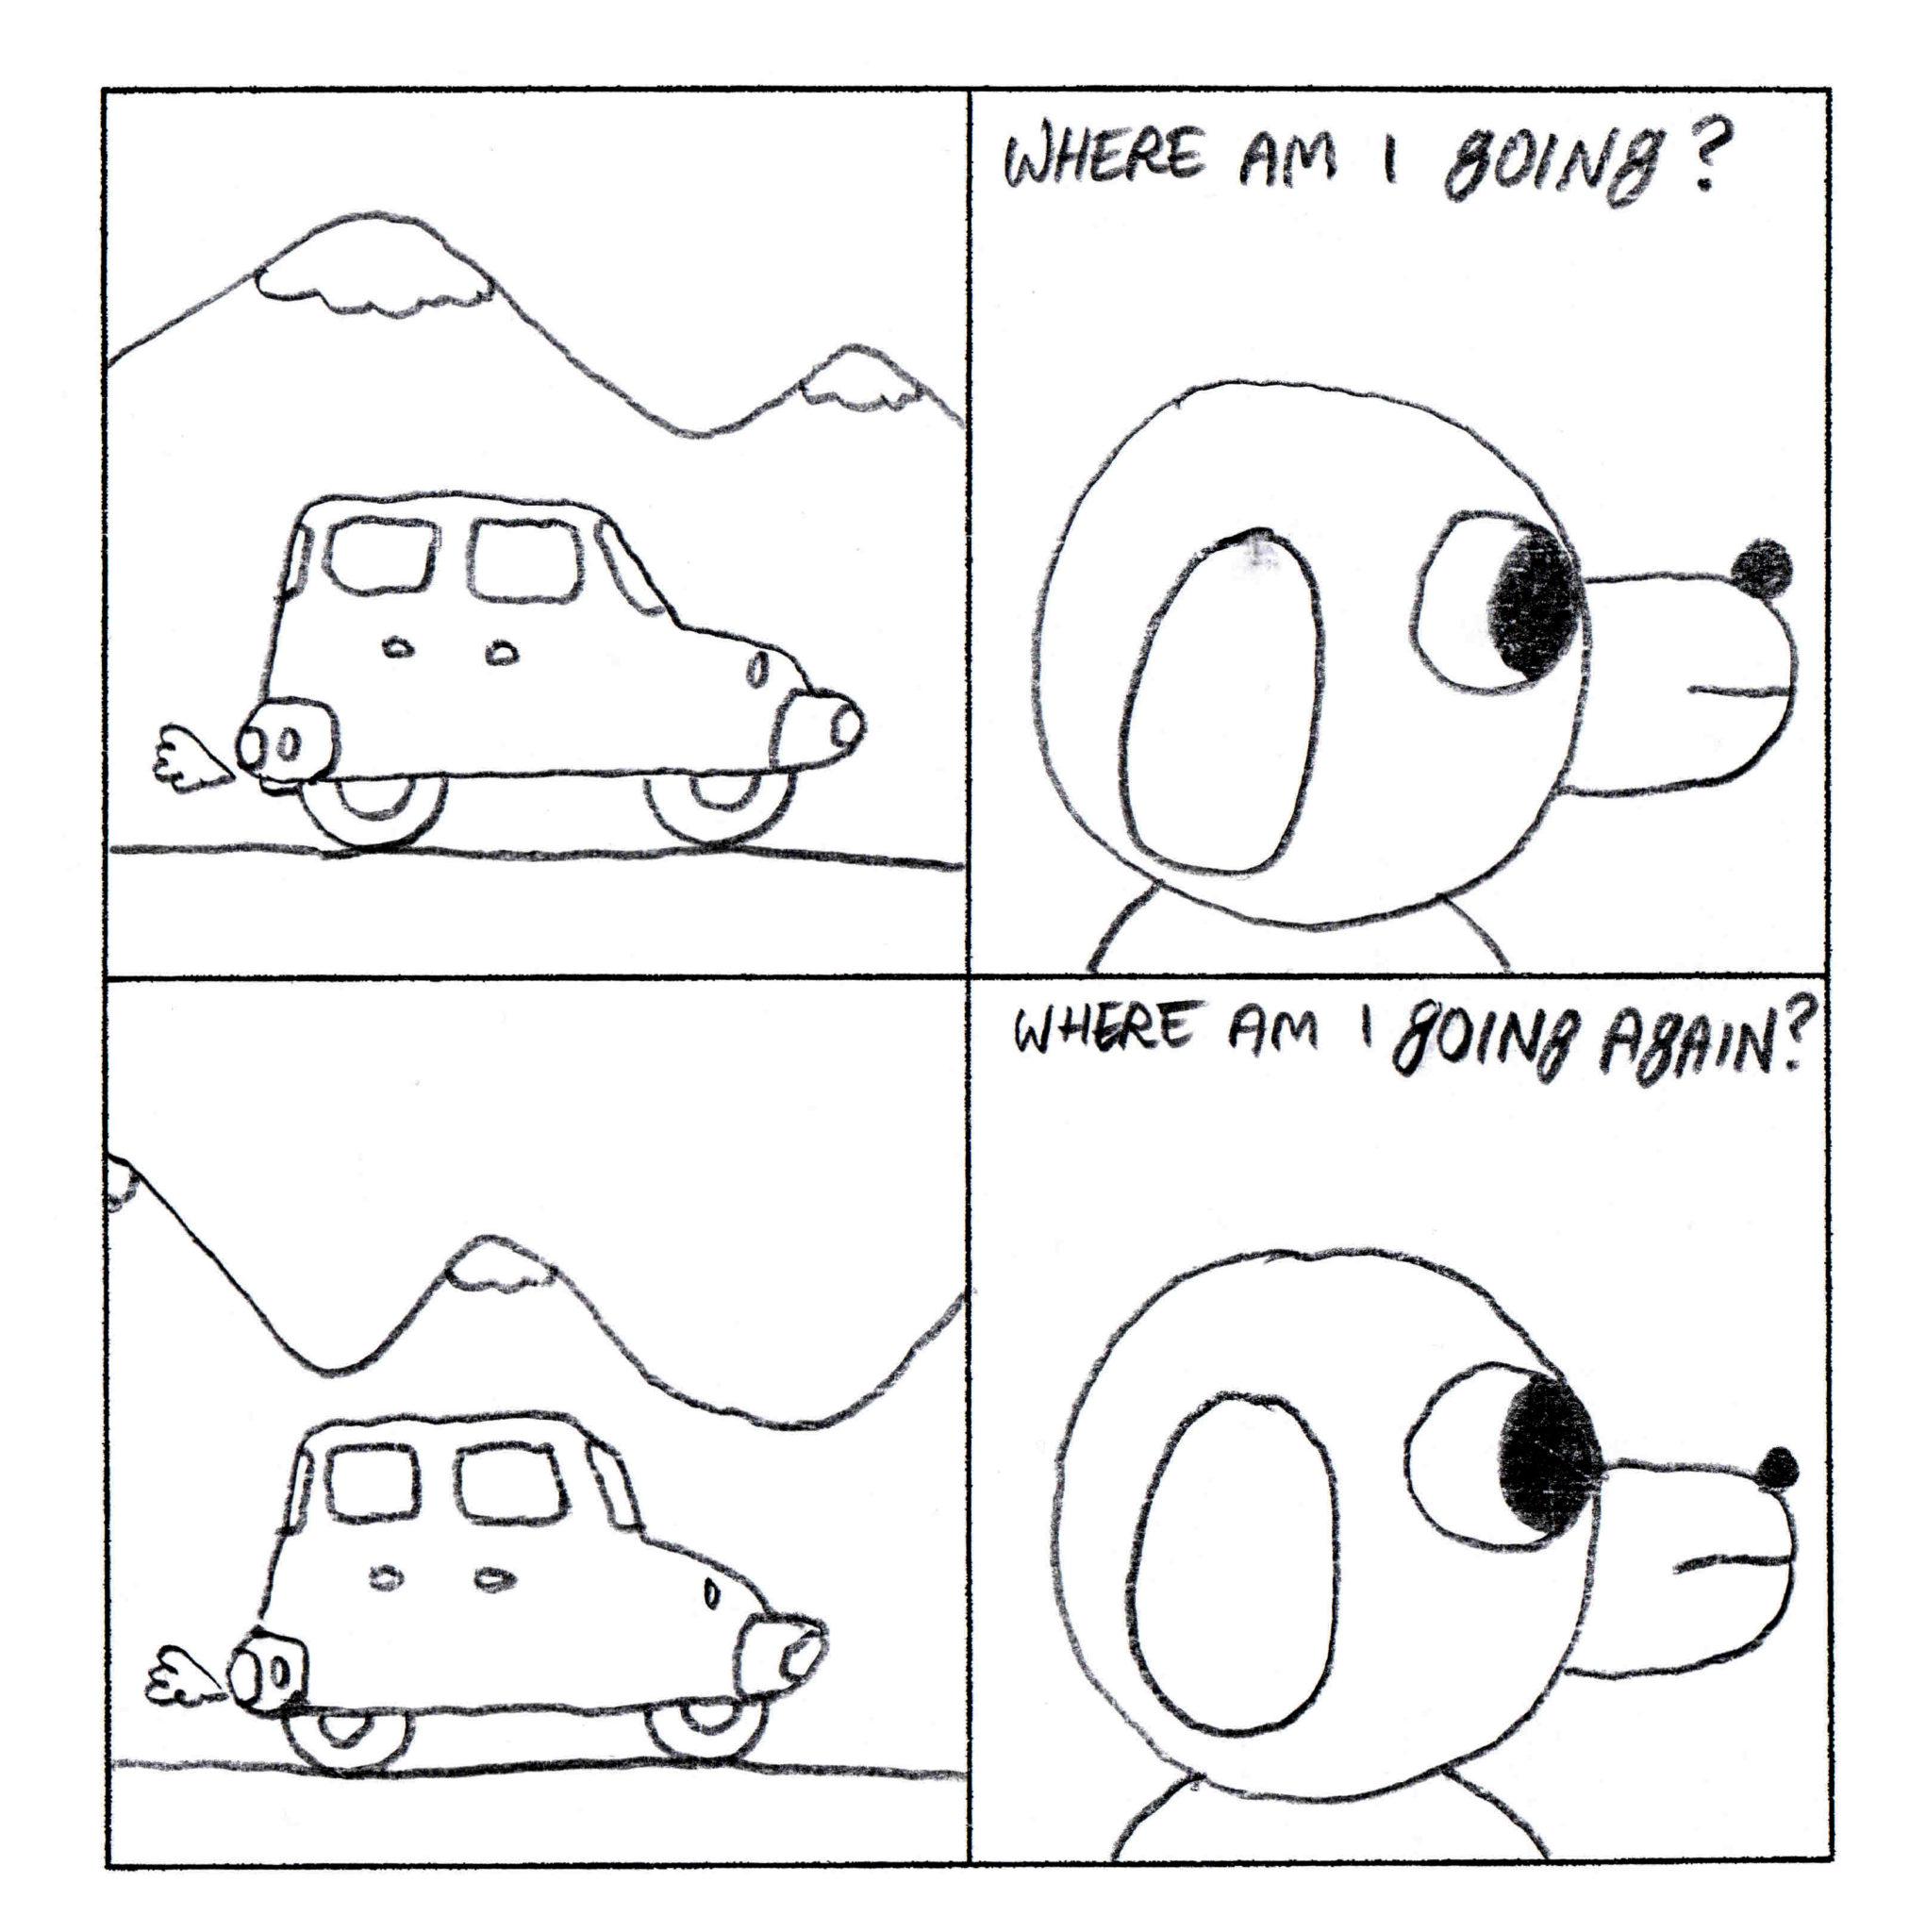 Dog Comics 31-40 - Page 1